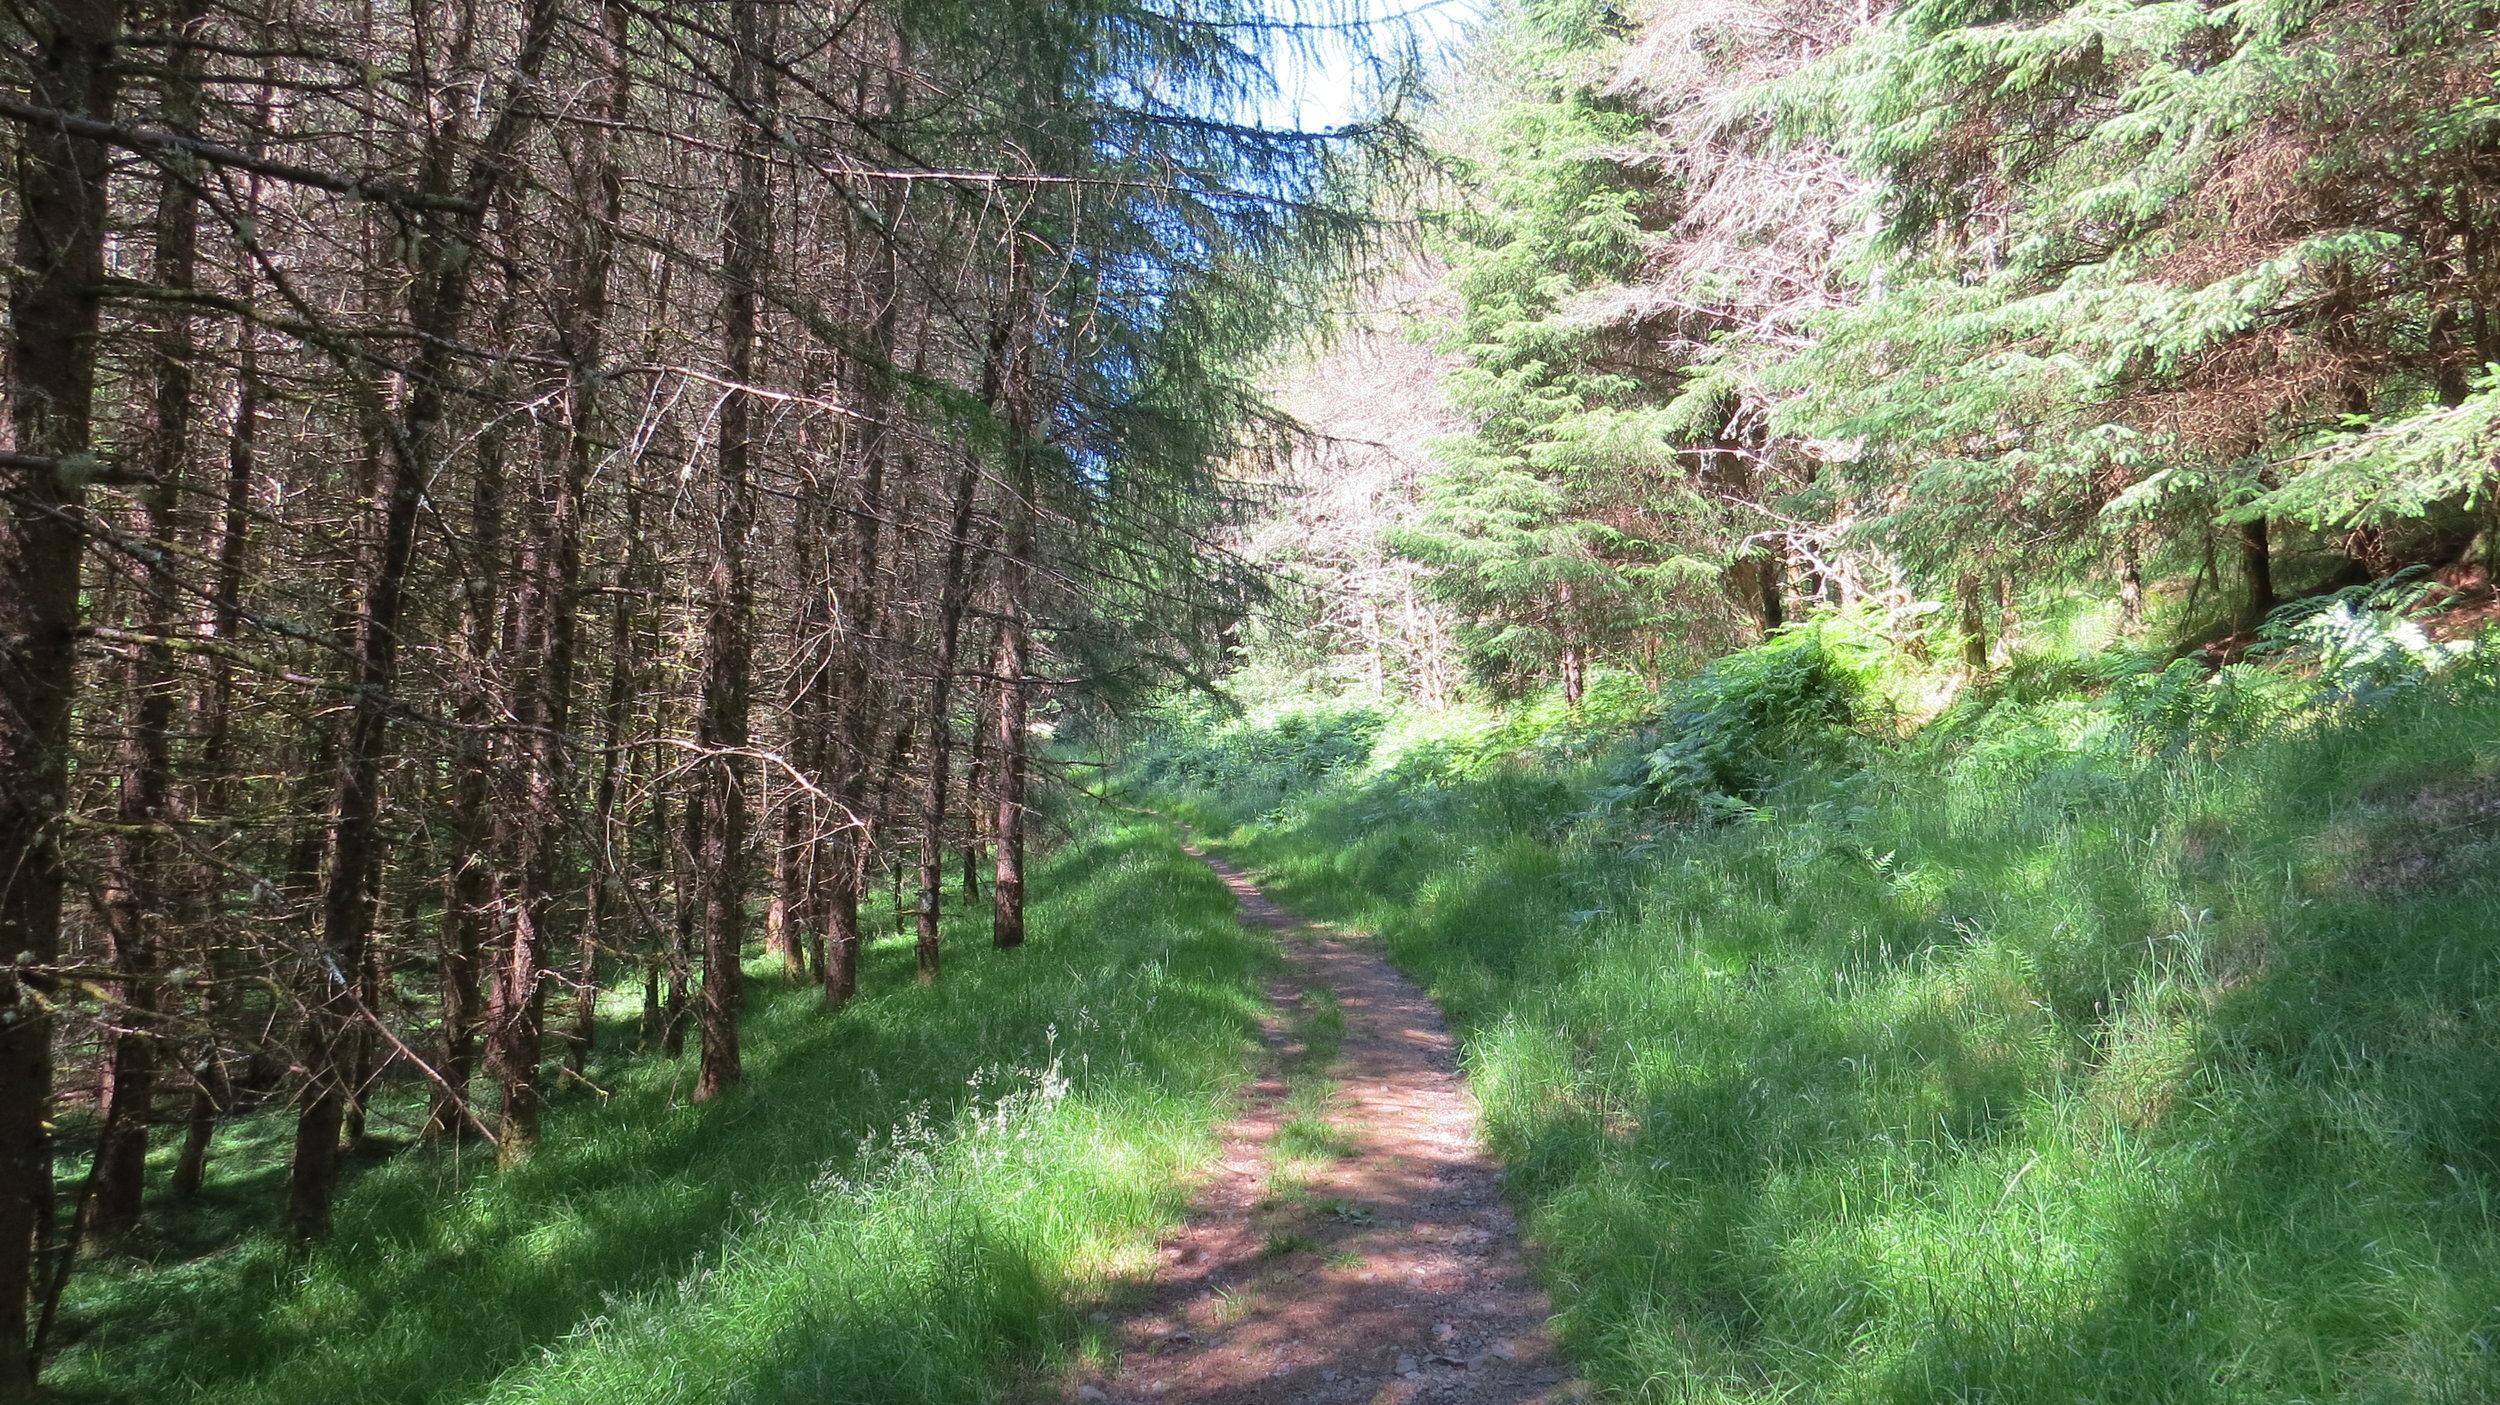 Track through Cologin Wood